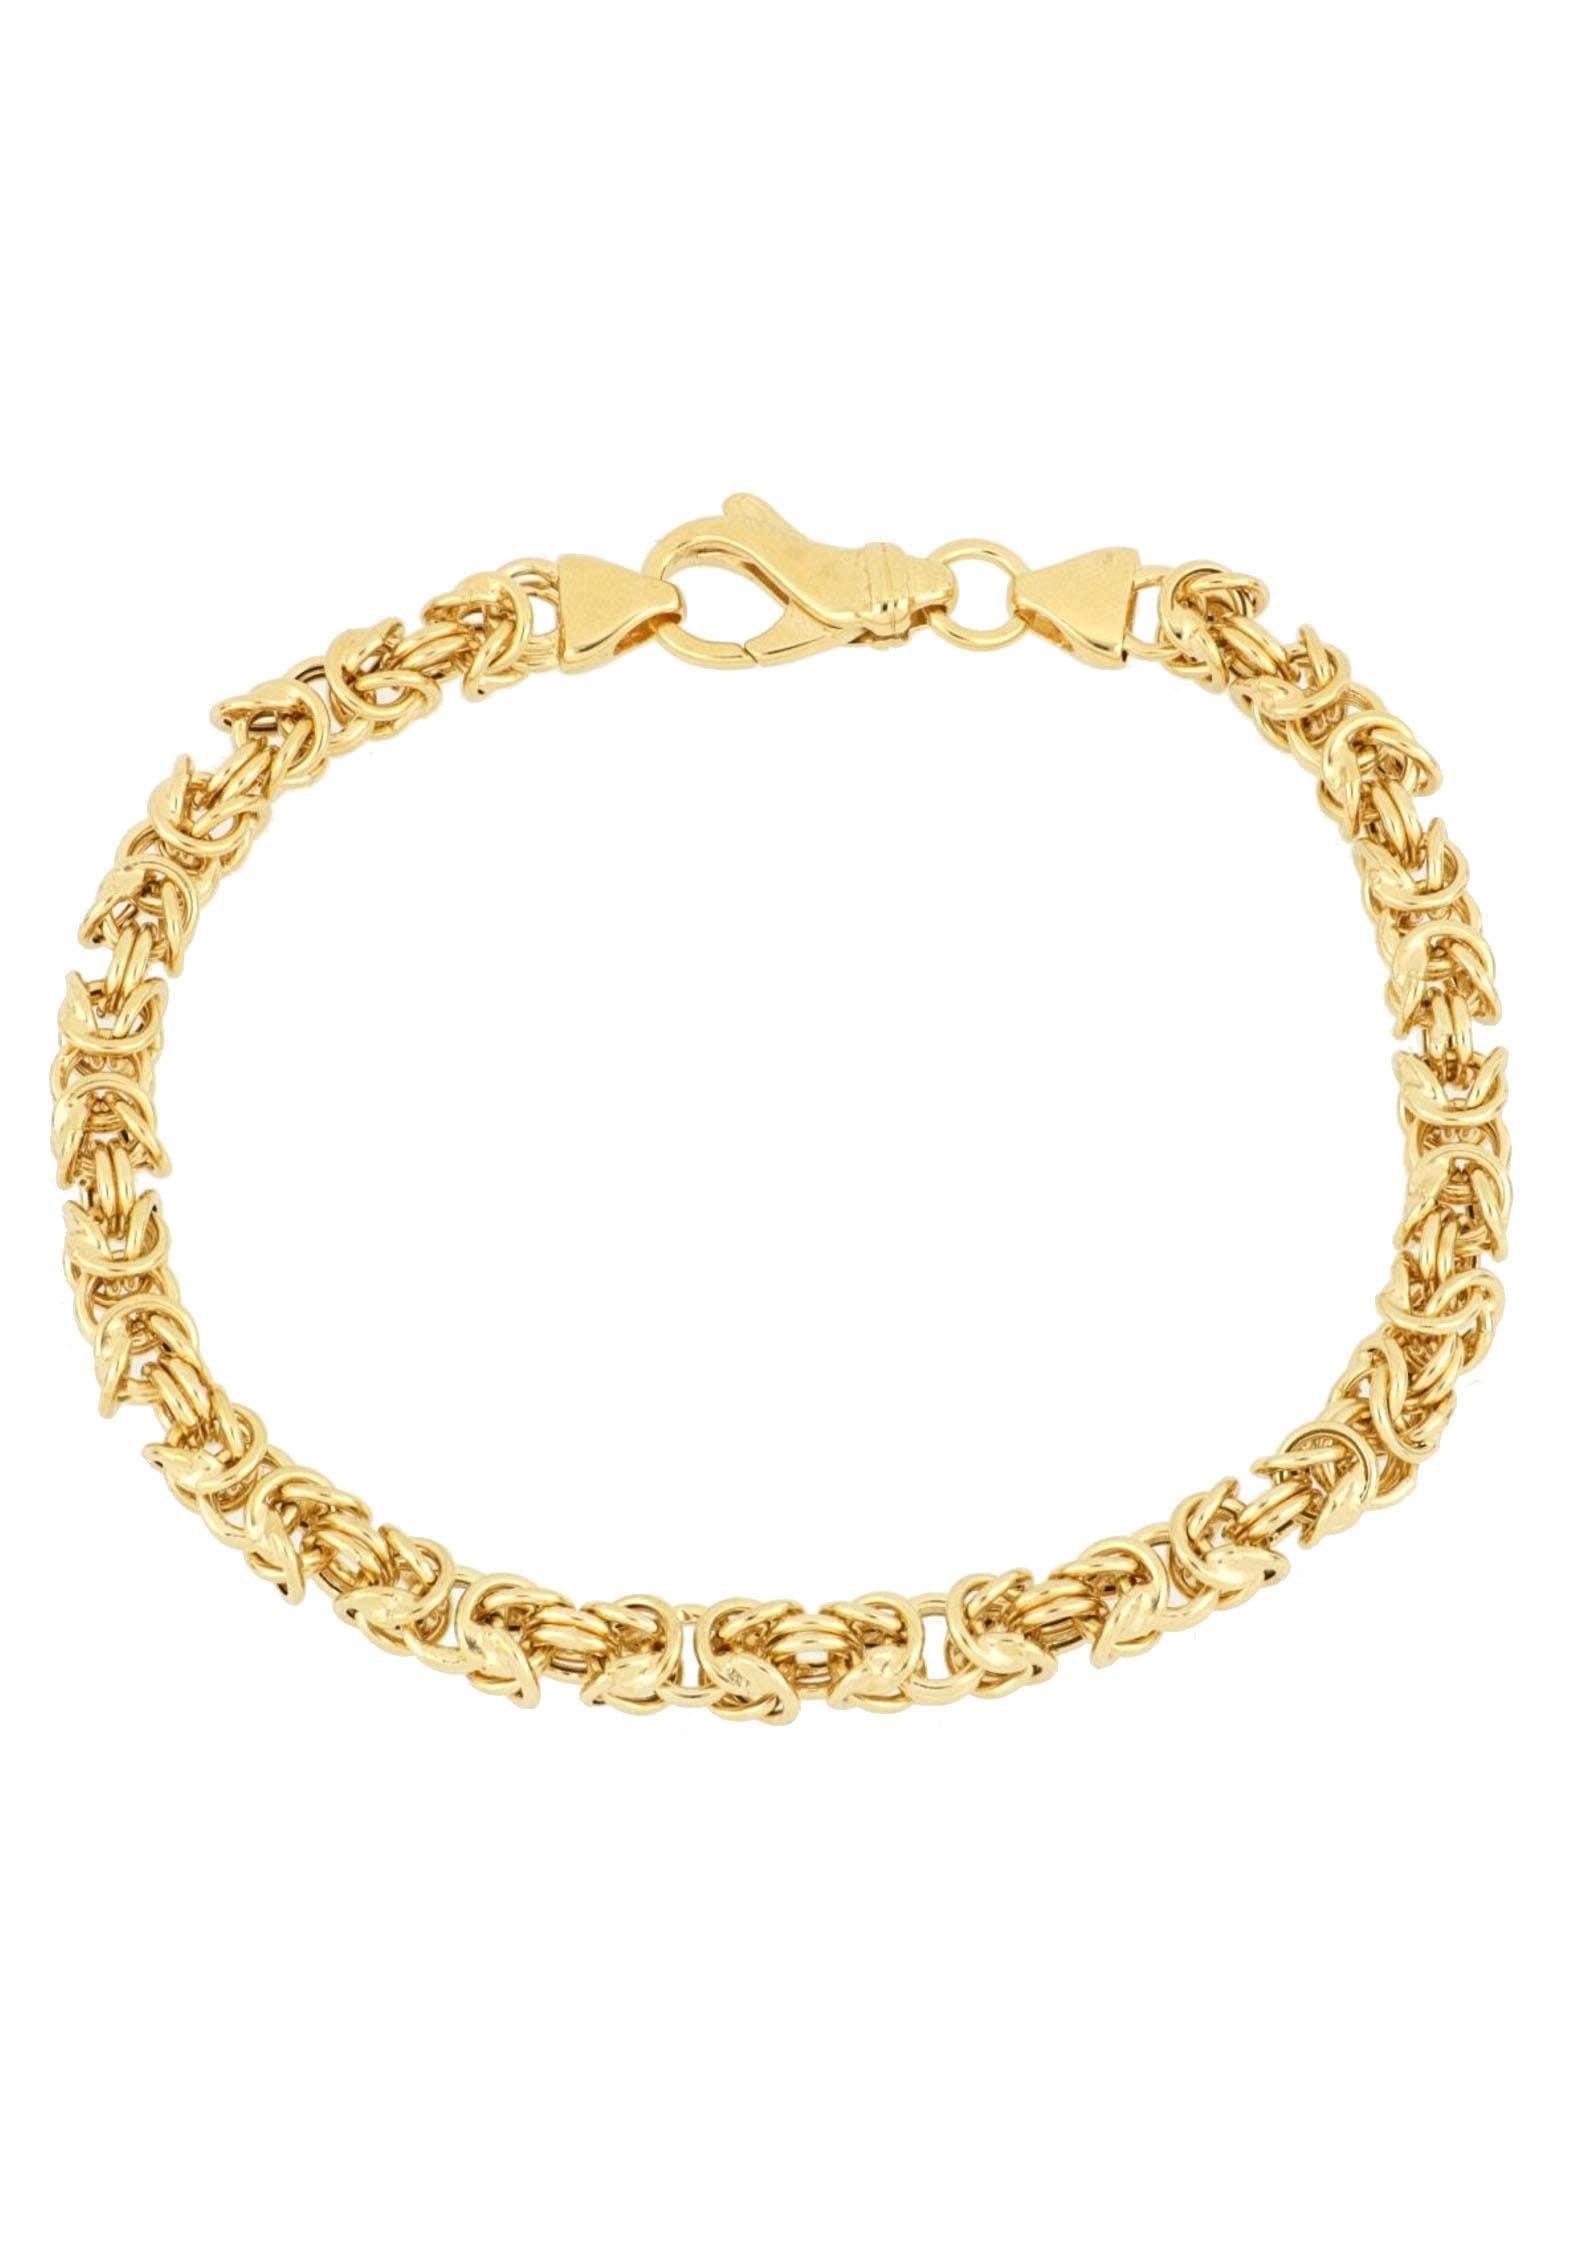 Firetti Armband in Königskettengliederung 50 mm vergoldet glanz quadratisch   Schmuck > Armbänder > Goldarmbänder   Firetti